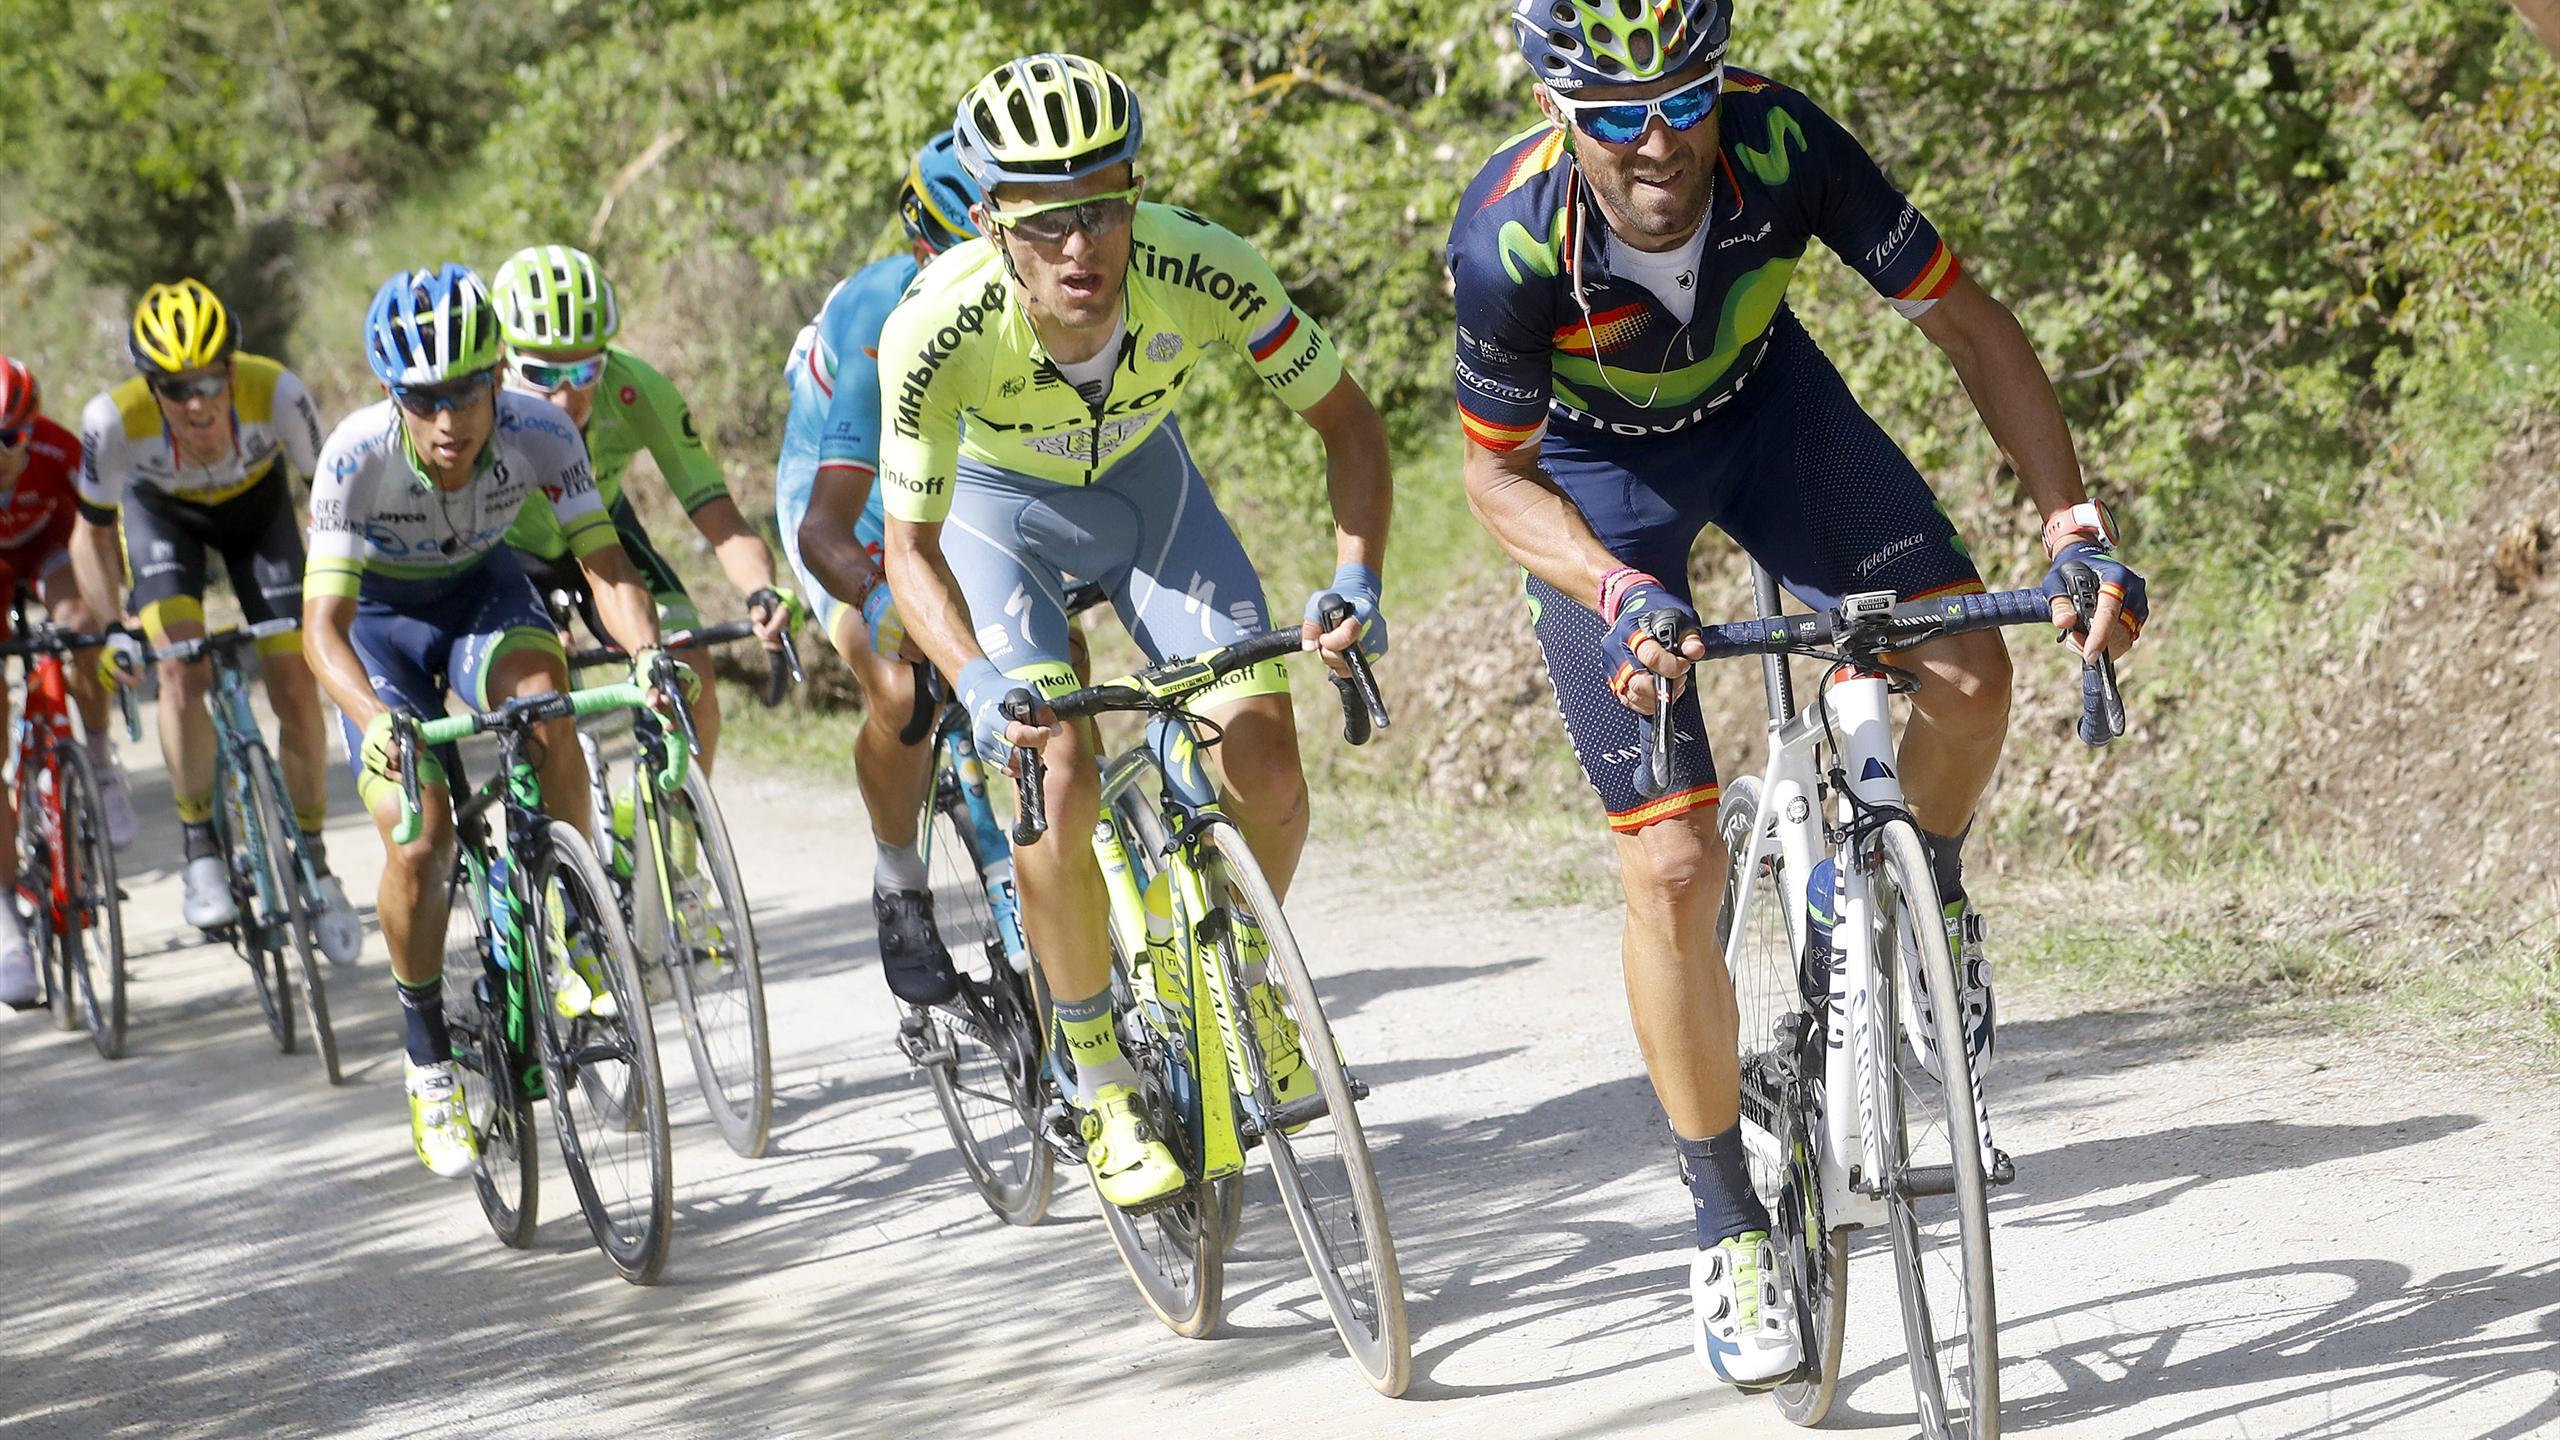 Sutherland not surprised by Movistar teammate Valverde's Giro GC contention